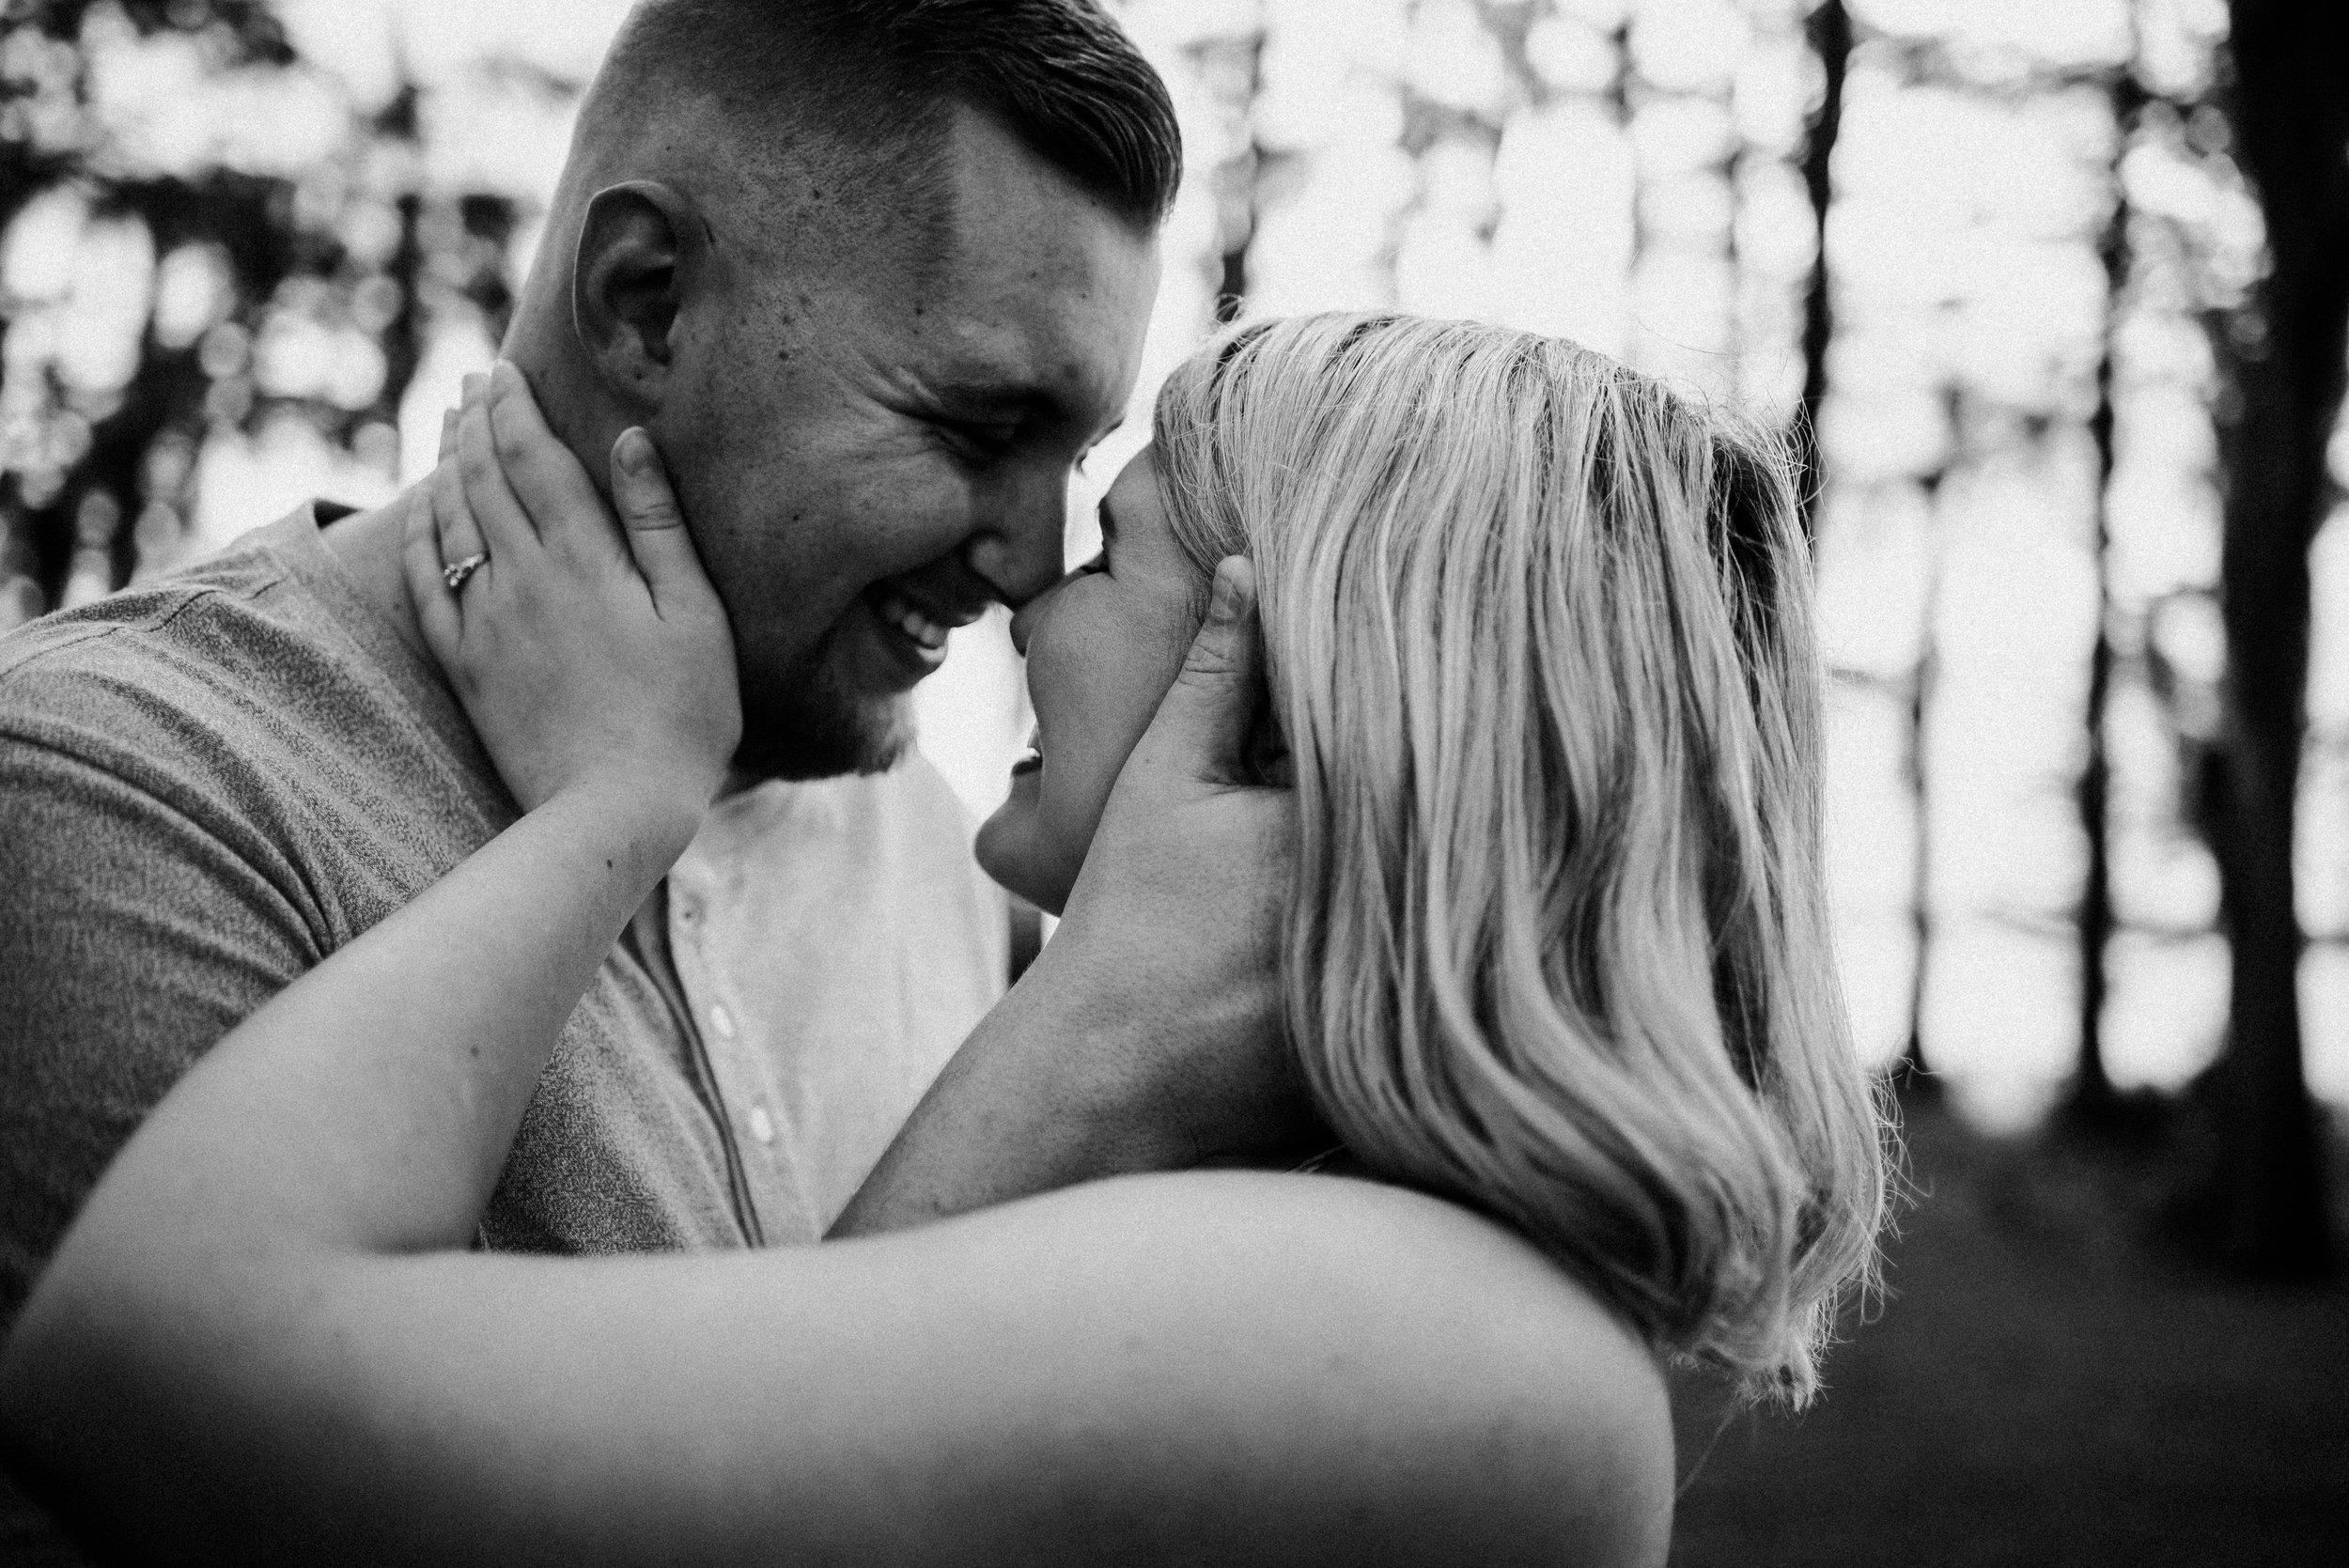 kimberly-trey-crestview-florida-couples-photographer-19.jpg